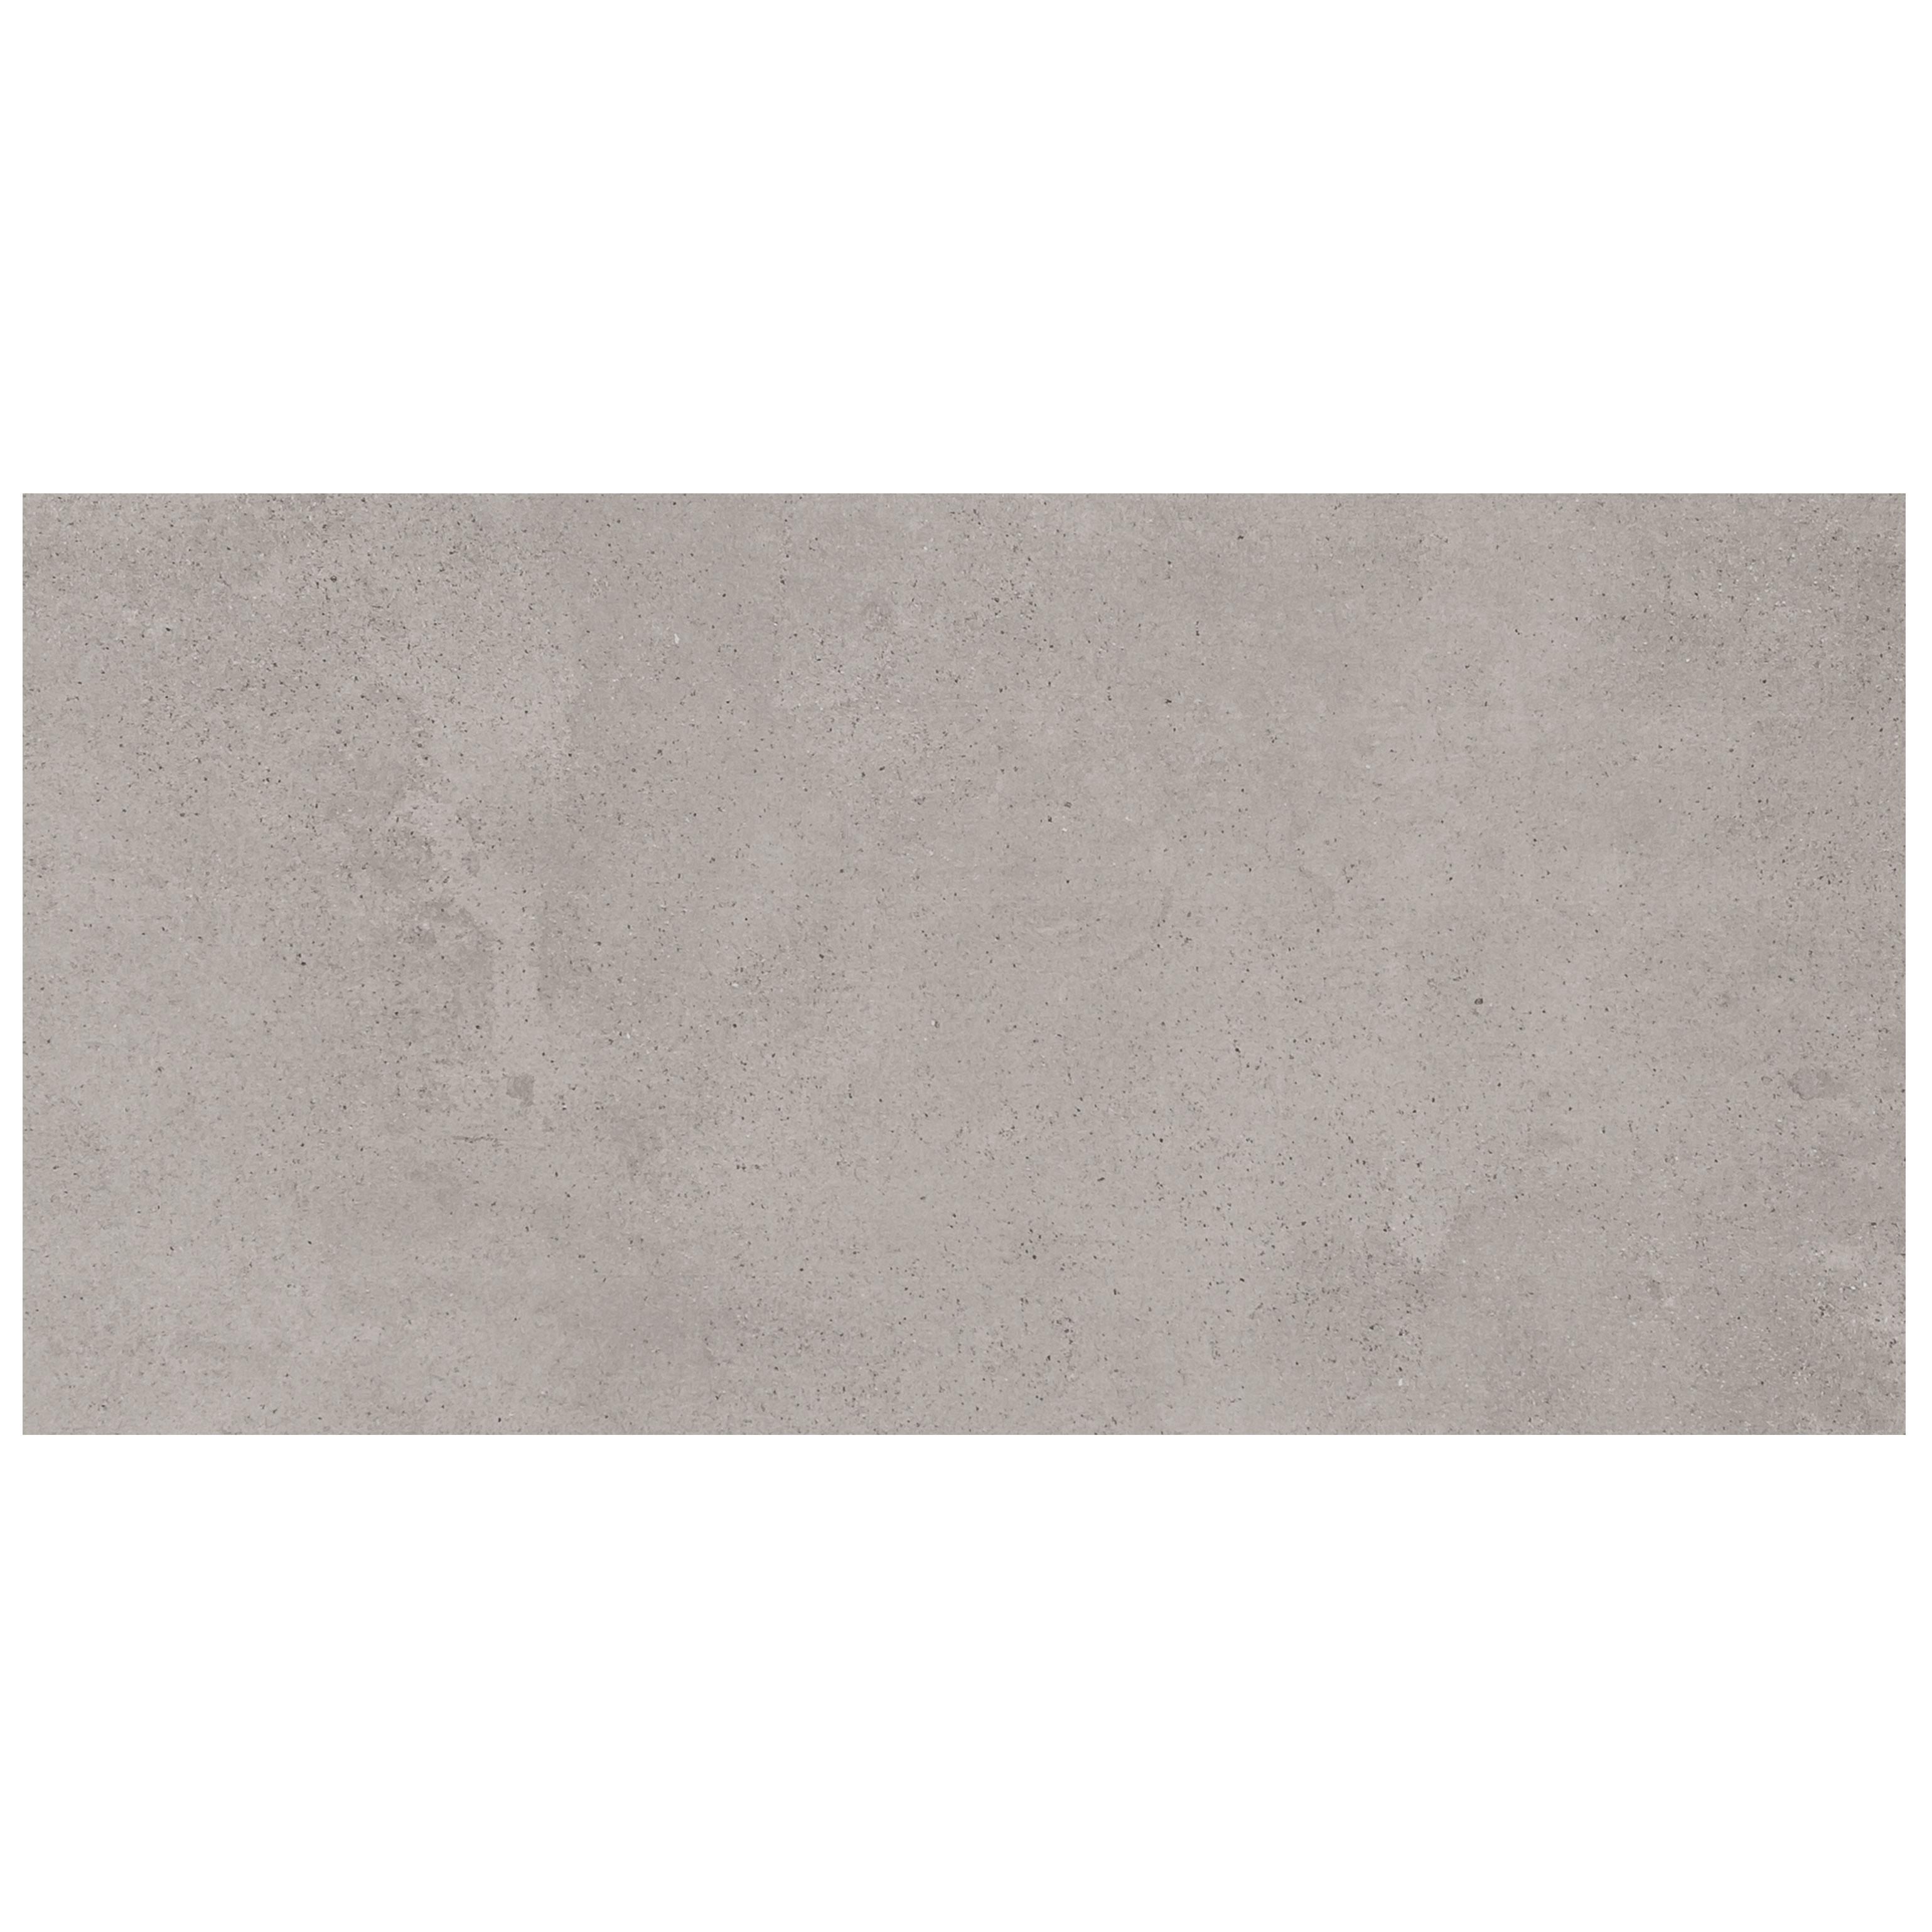 Klinker Arredo Powder Argent 30×60 cm